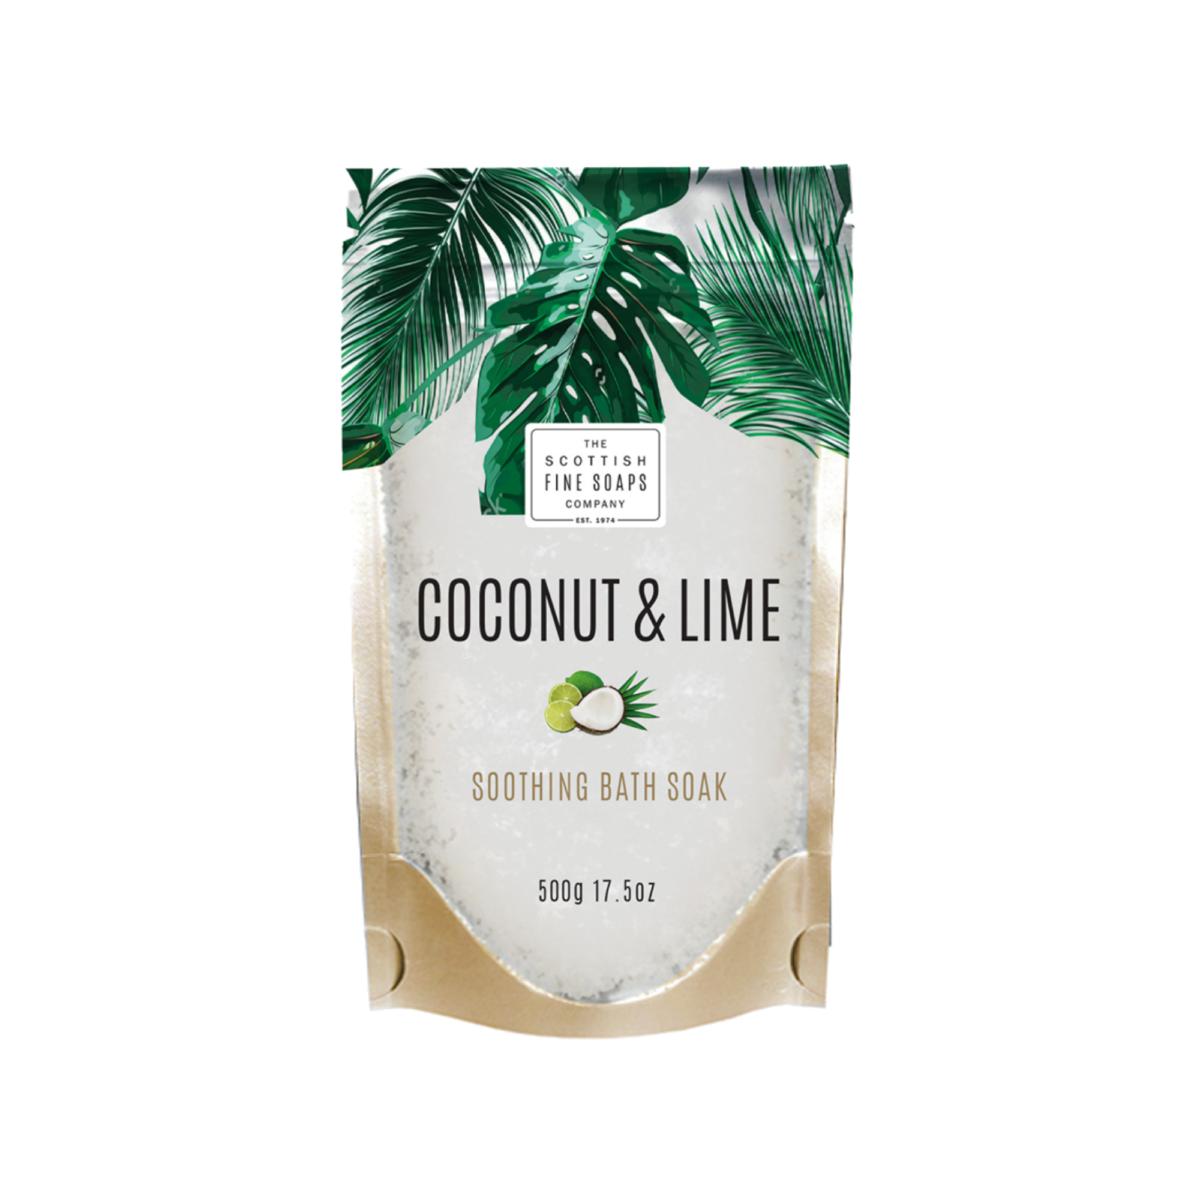 Coconut & Lime Soothing Bath Soak